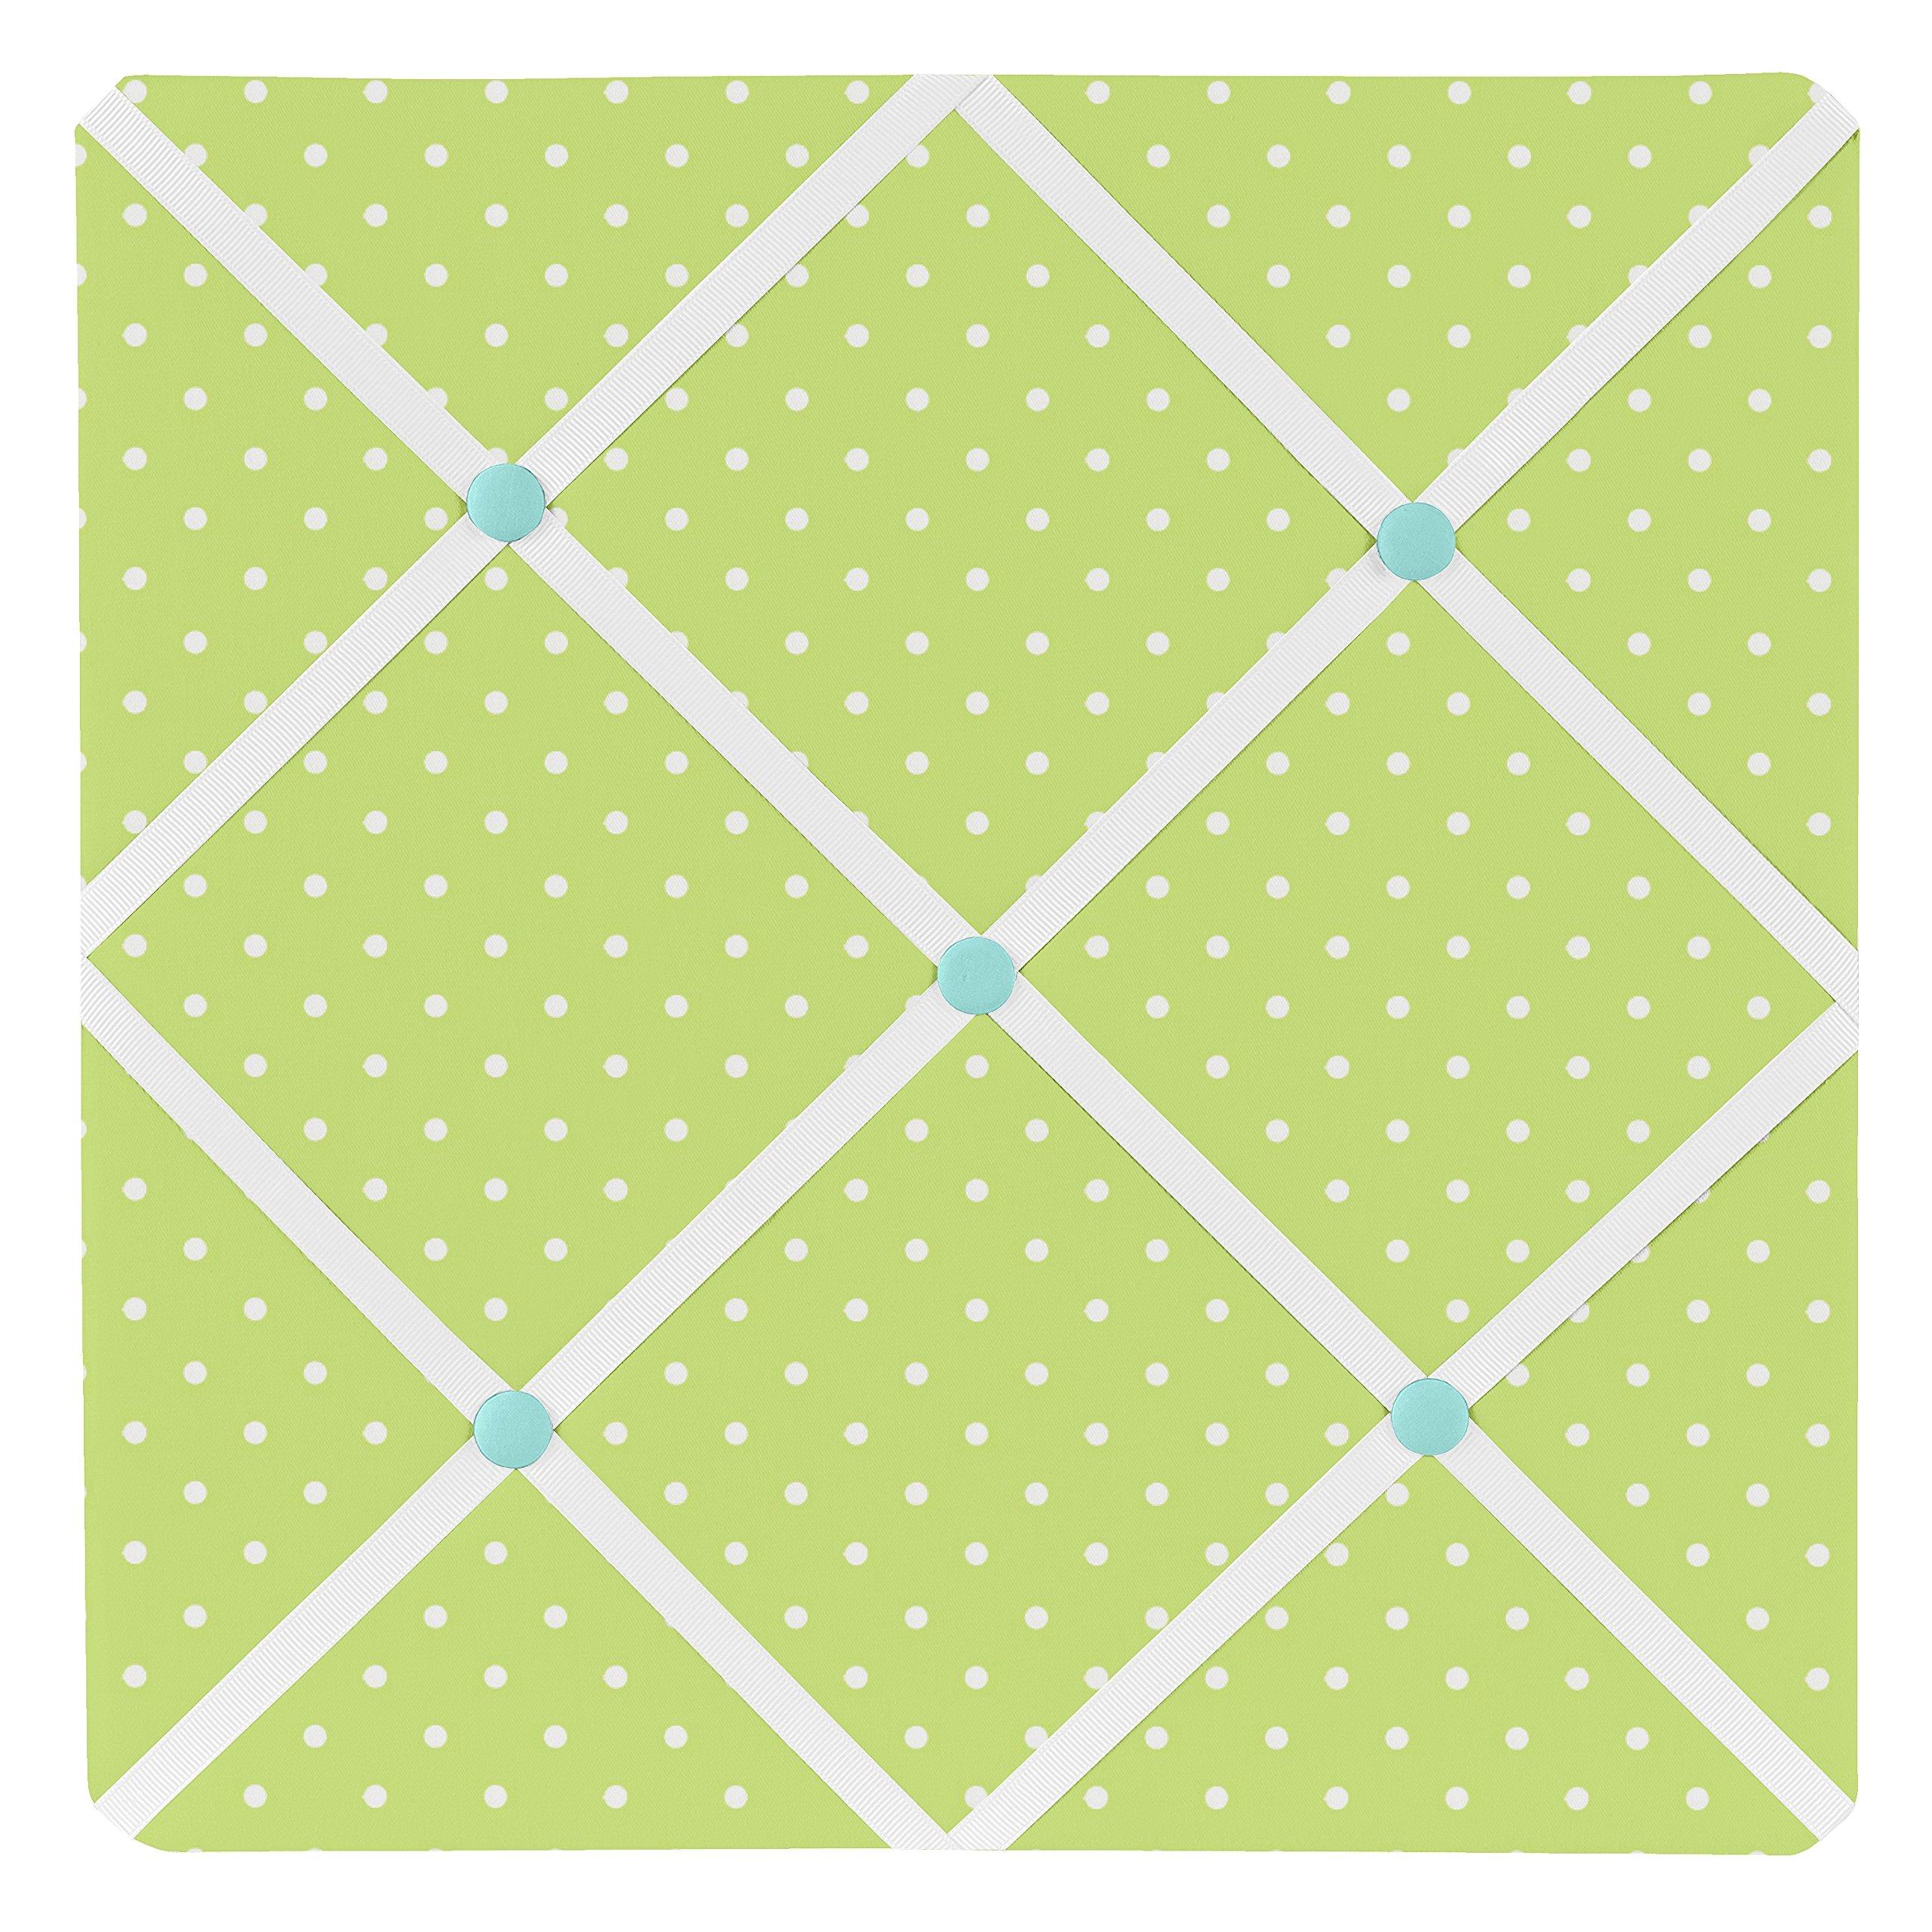 Sweet Jojo Designs Turquoise and Lime Hooty Owl Fabric Memory/Memo Photo Bulletin Board